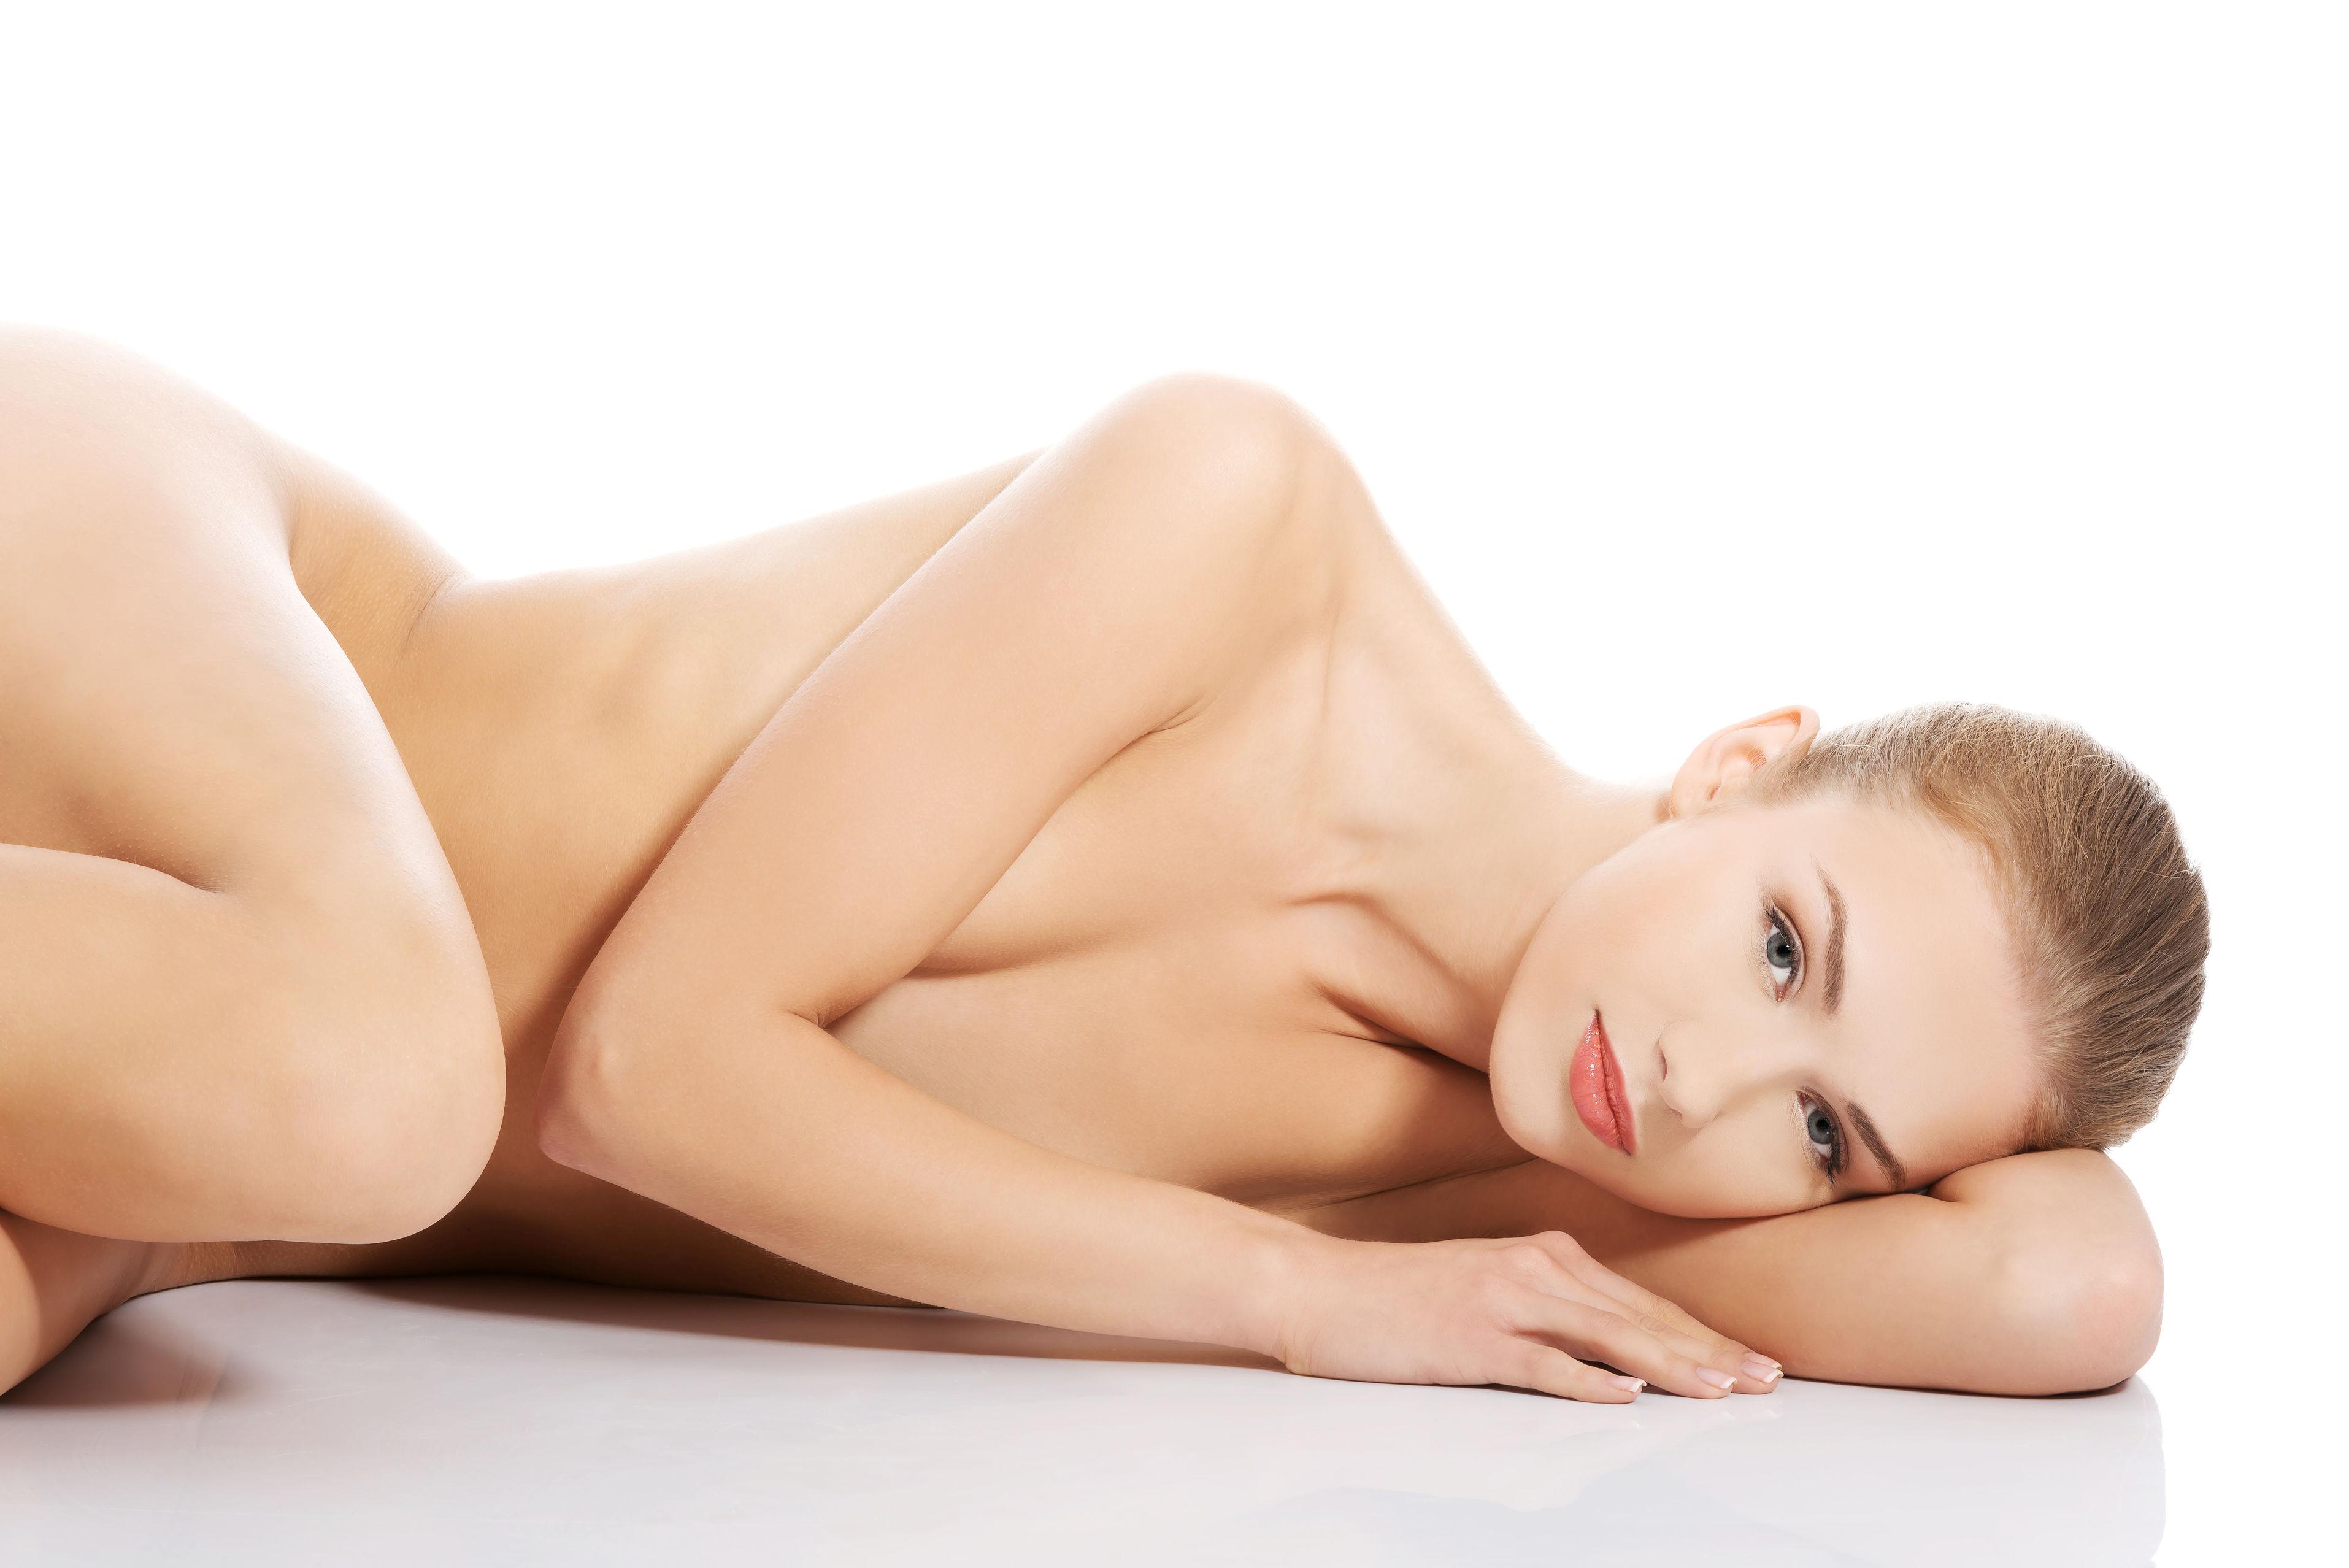 Estrellas latinass fotografia mujer mayor particular desnuda